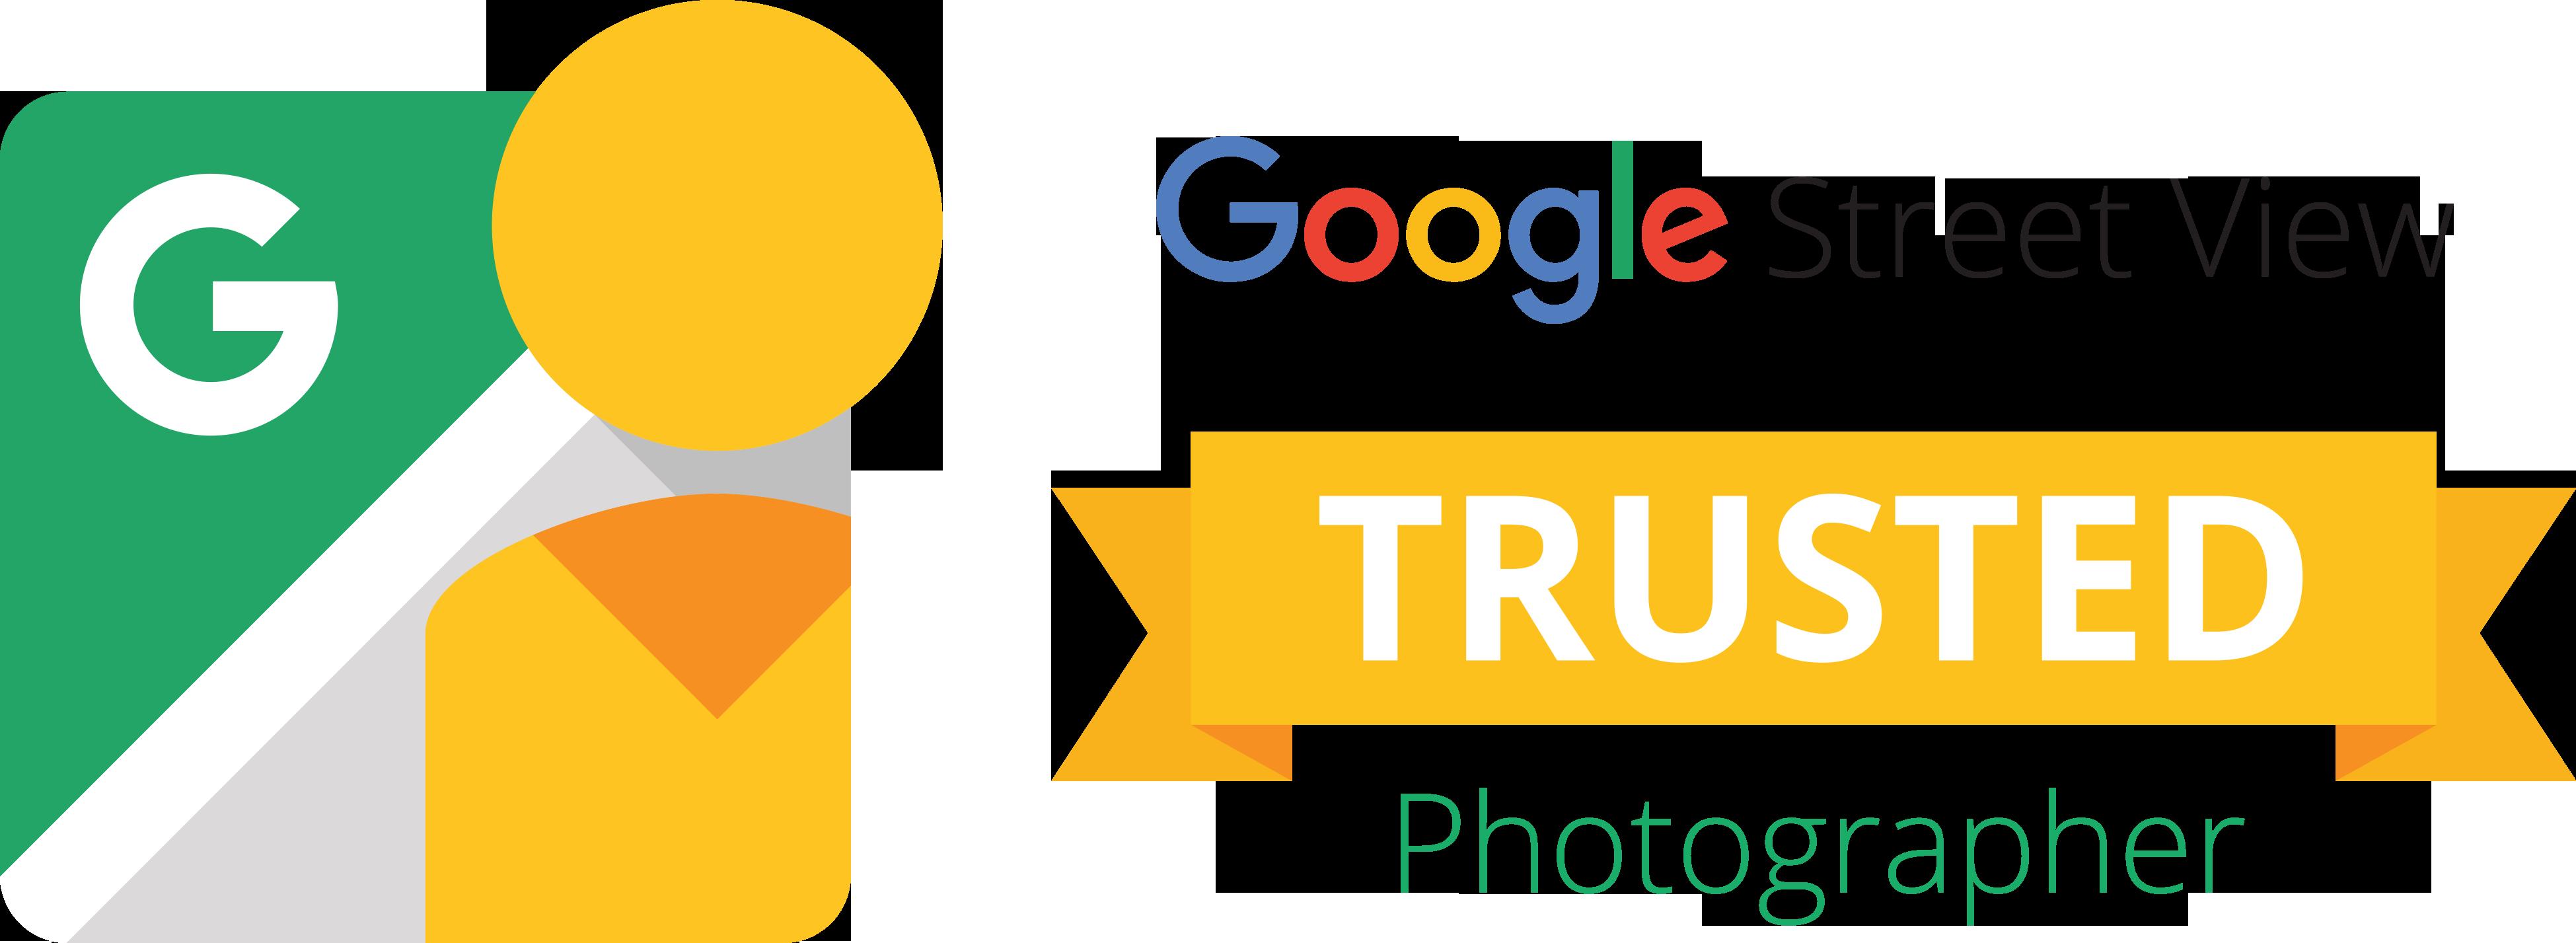 Fotograf google - wirtualny spacer panorama 360 rekomendowany fotograf google street view